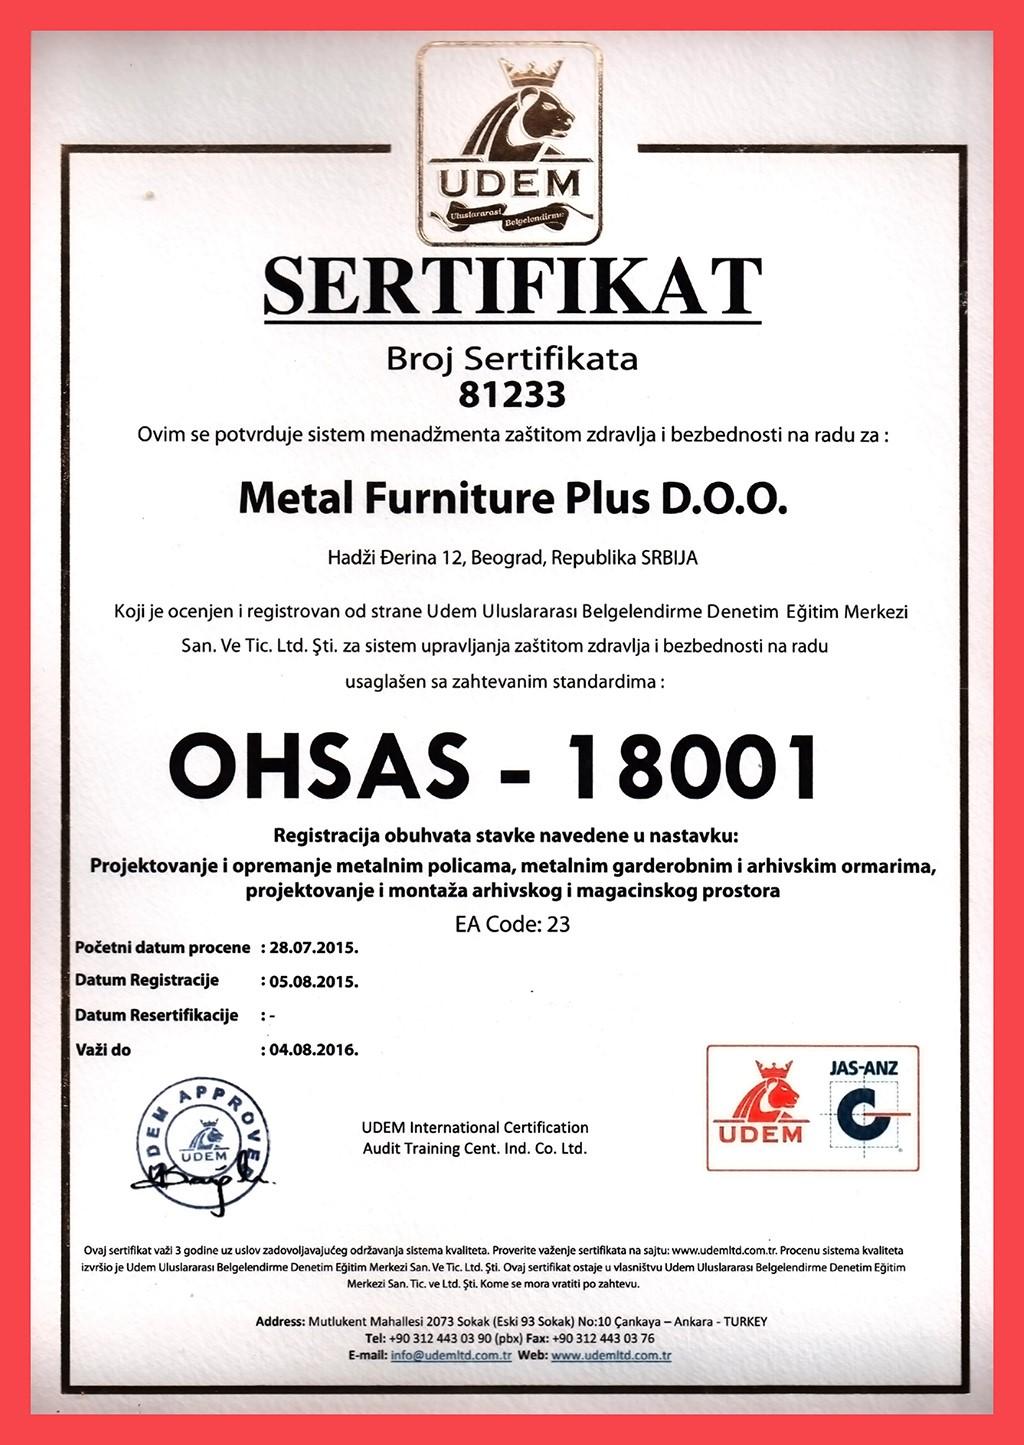 Sertifikat OHSAS - 18001